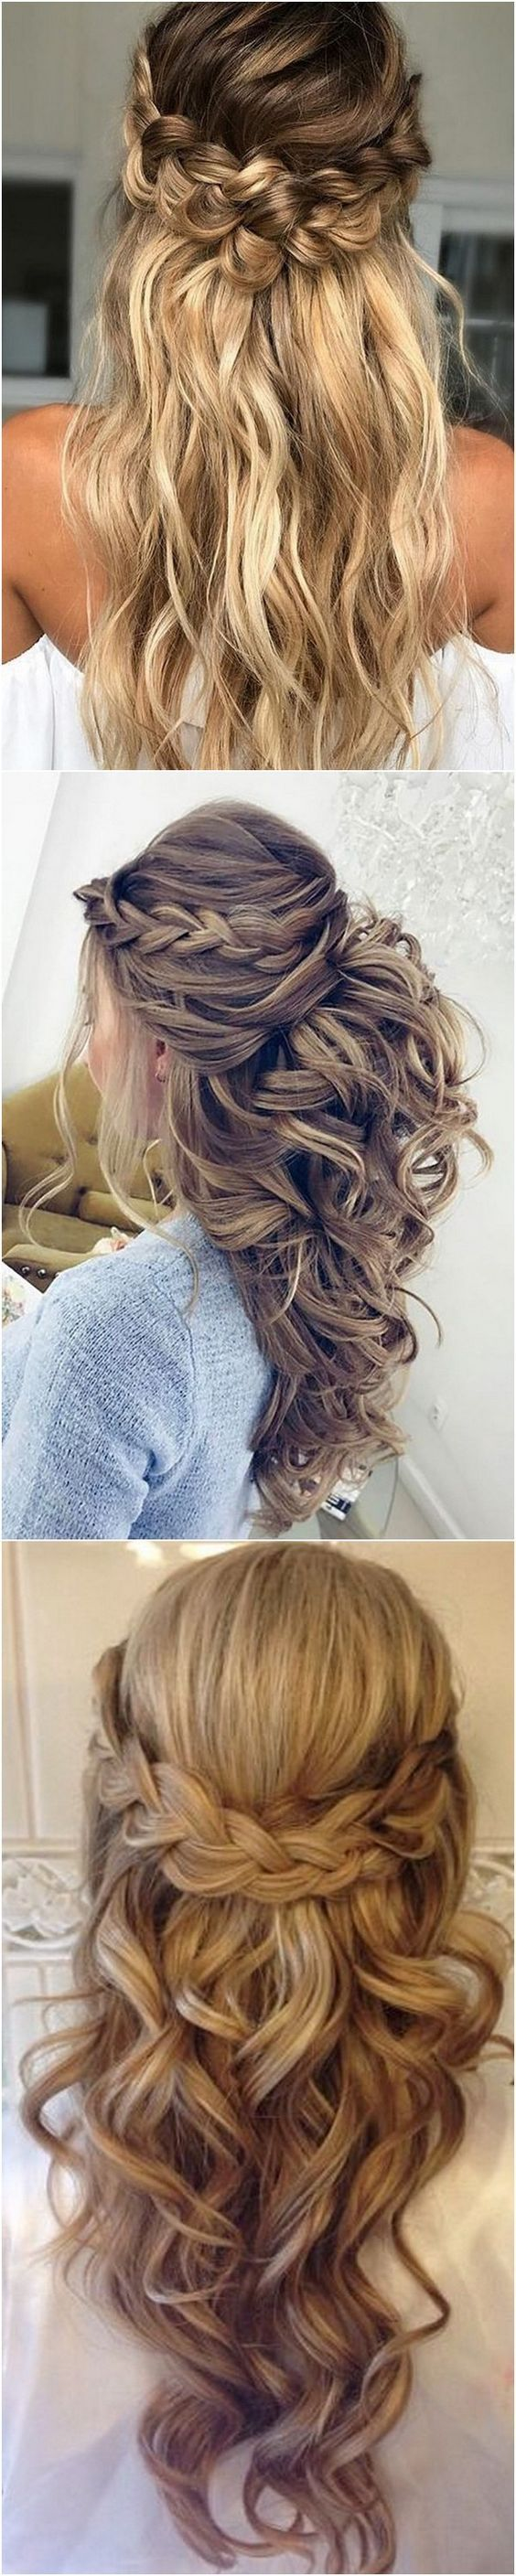 Pretty half up half down wedding hairstyle ideas  Hair  Pinterest